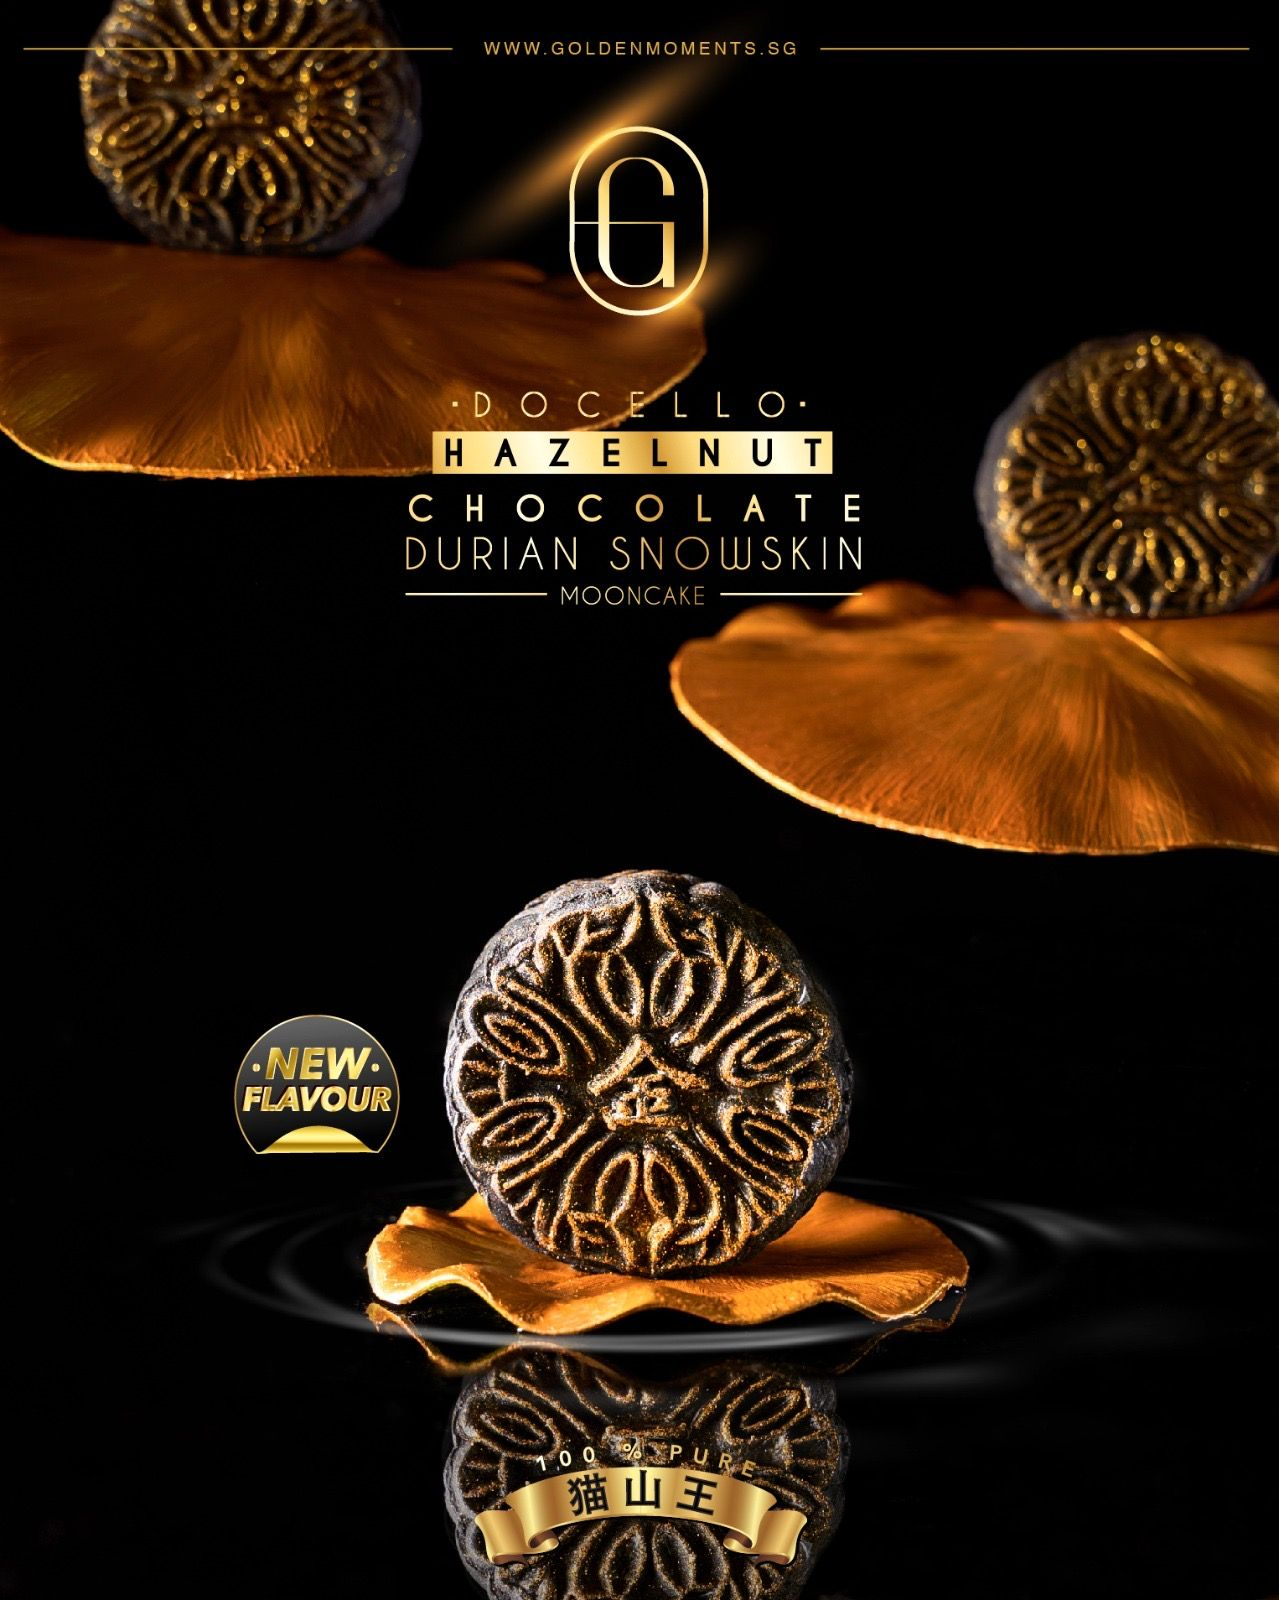 Single Piece Docello Hazelnut Chocolate Mao Shan Wang Snowskin Mooncake (1 Piece Only)